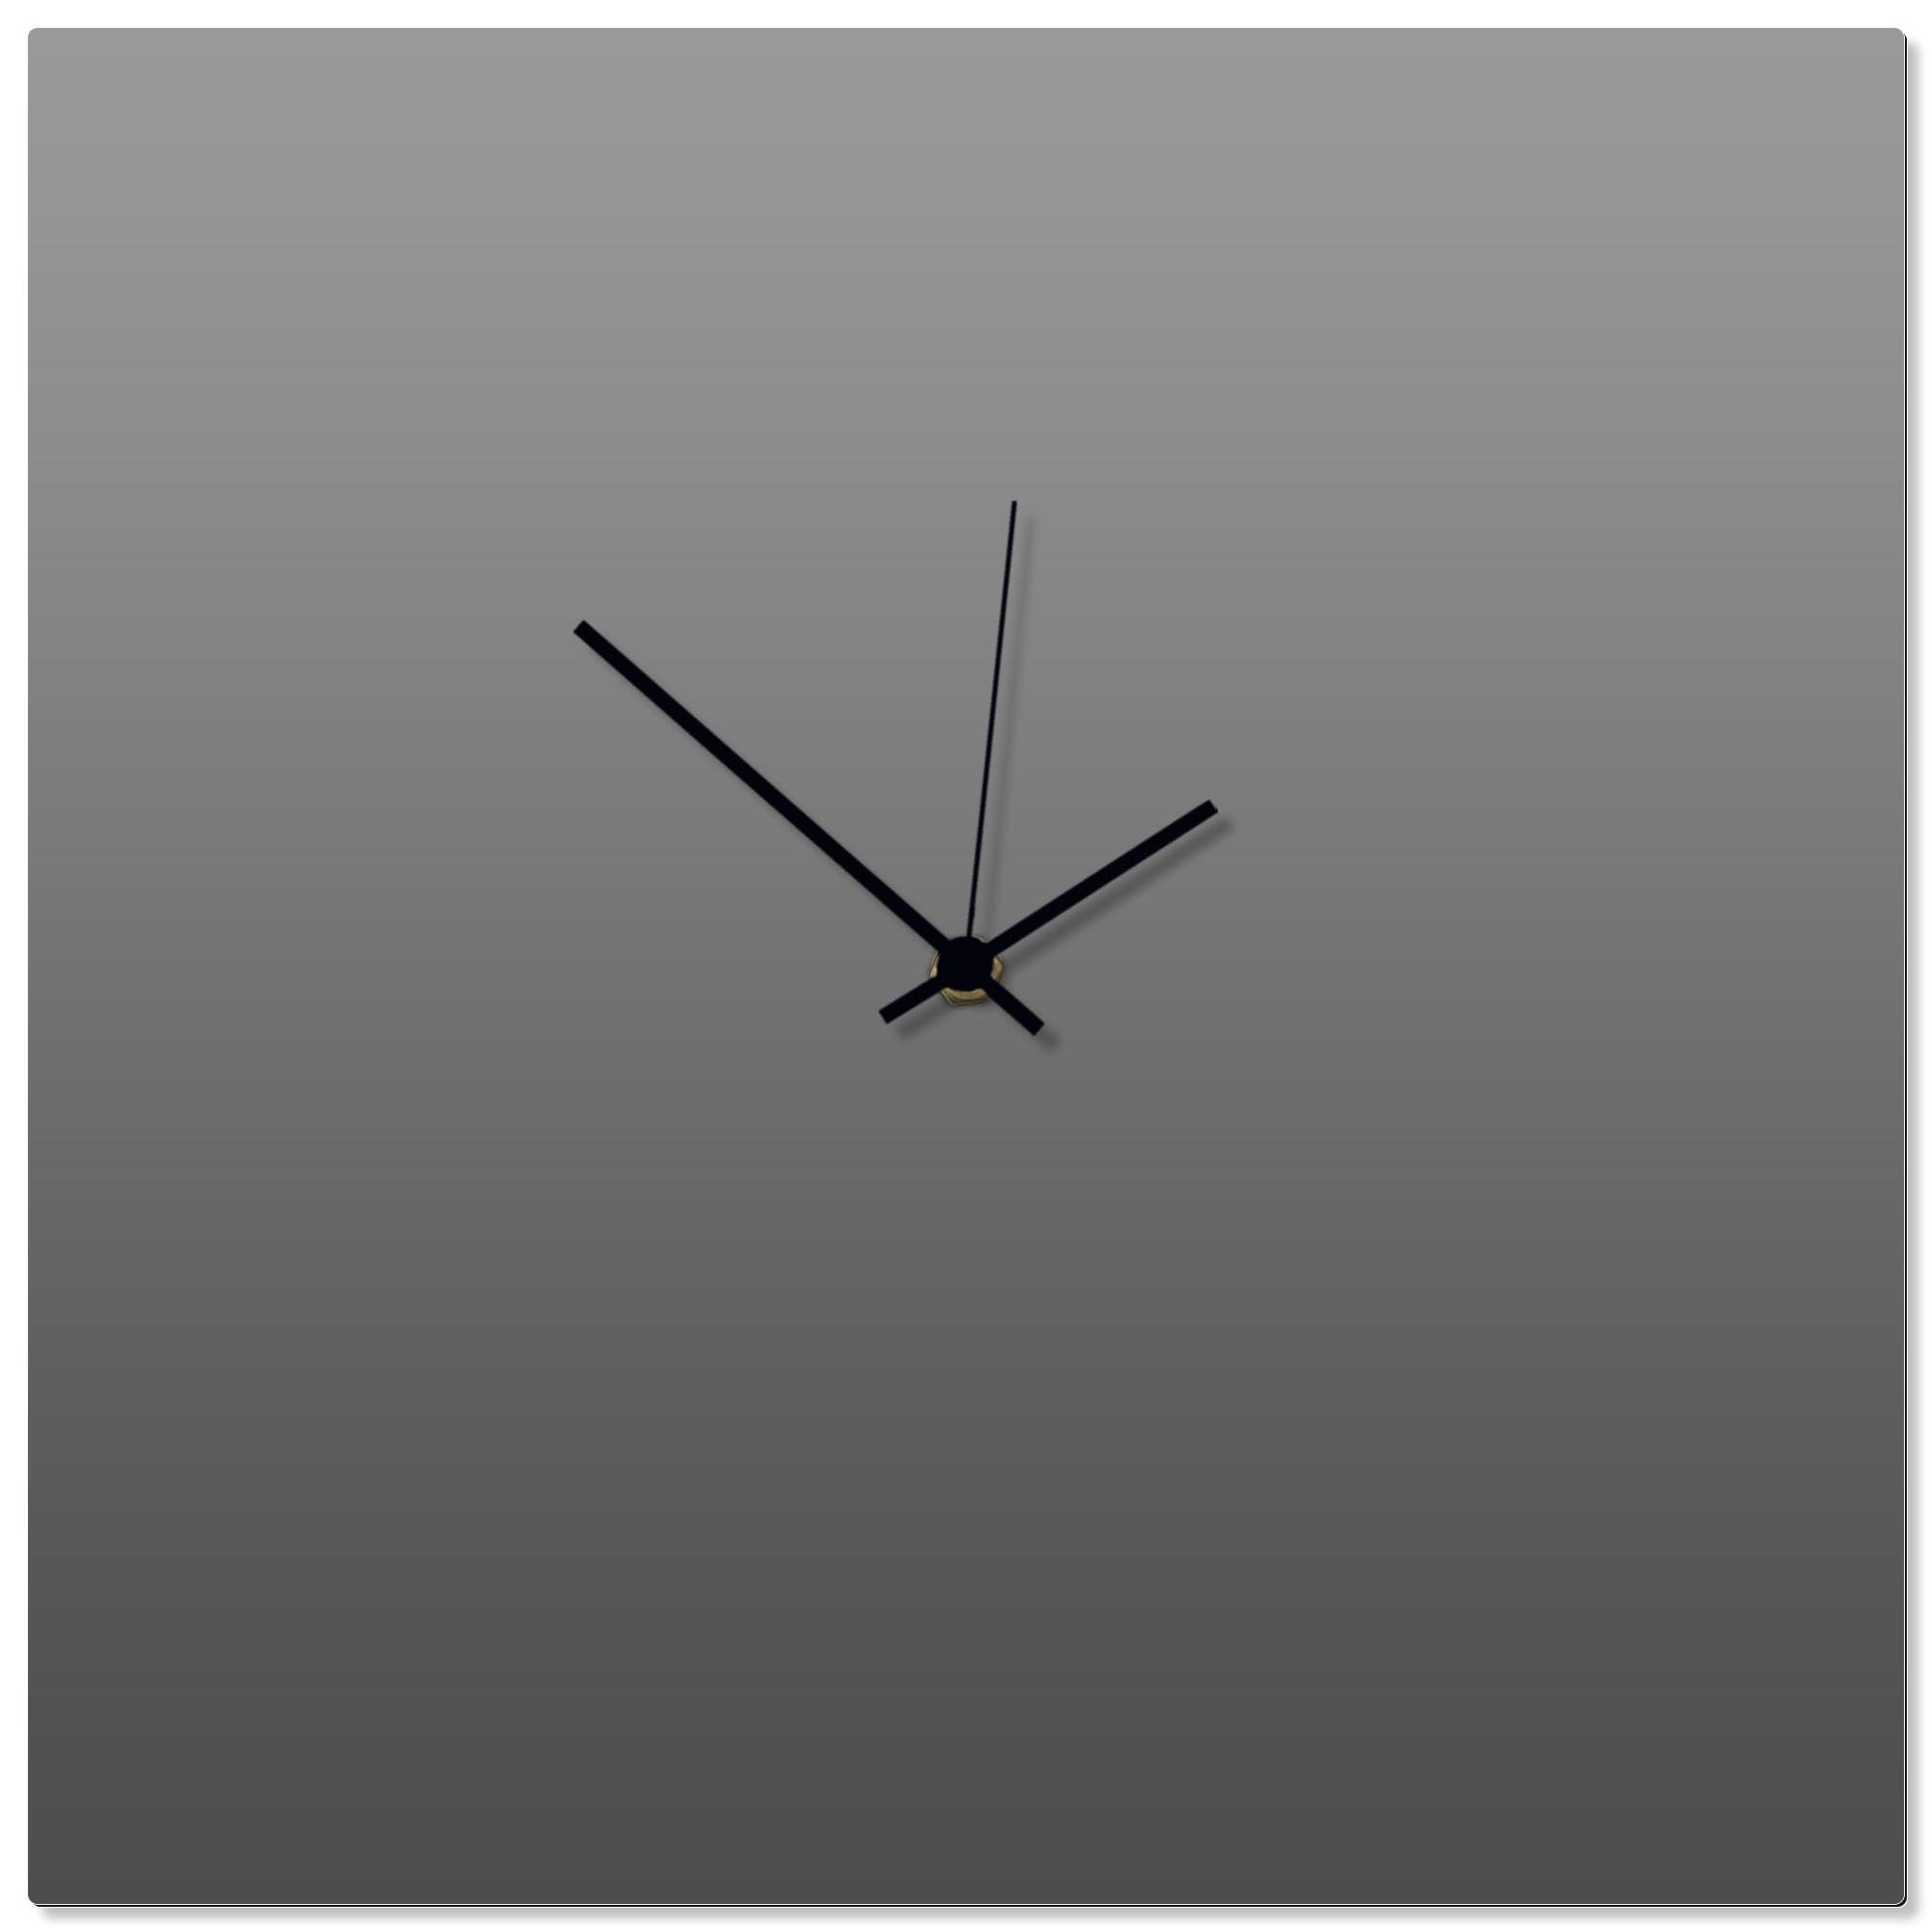 Grayout Black Square Clock 16x16in. Aluminum Polymetal